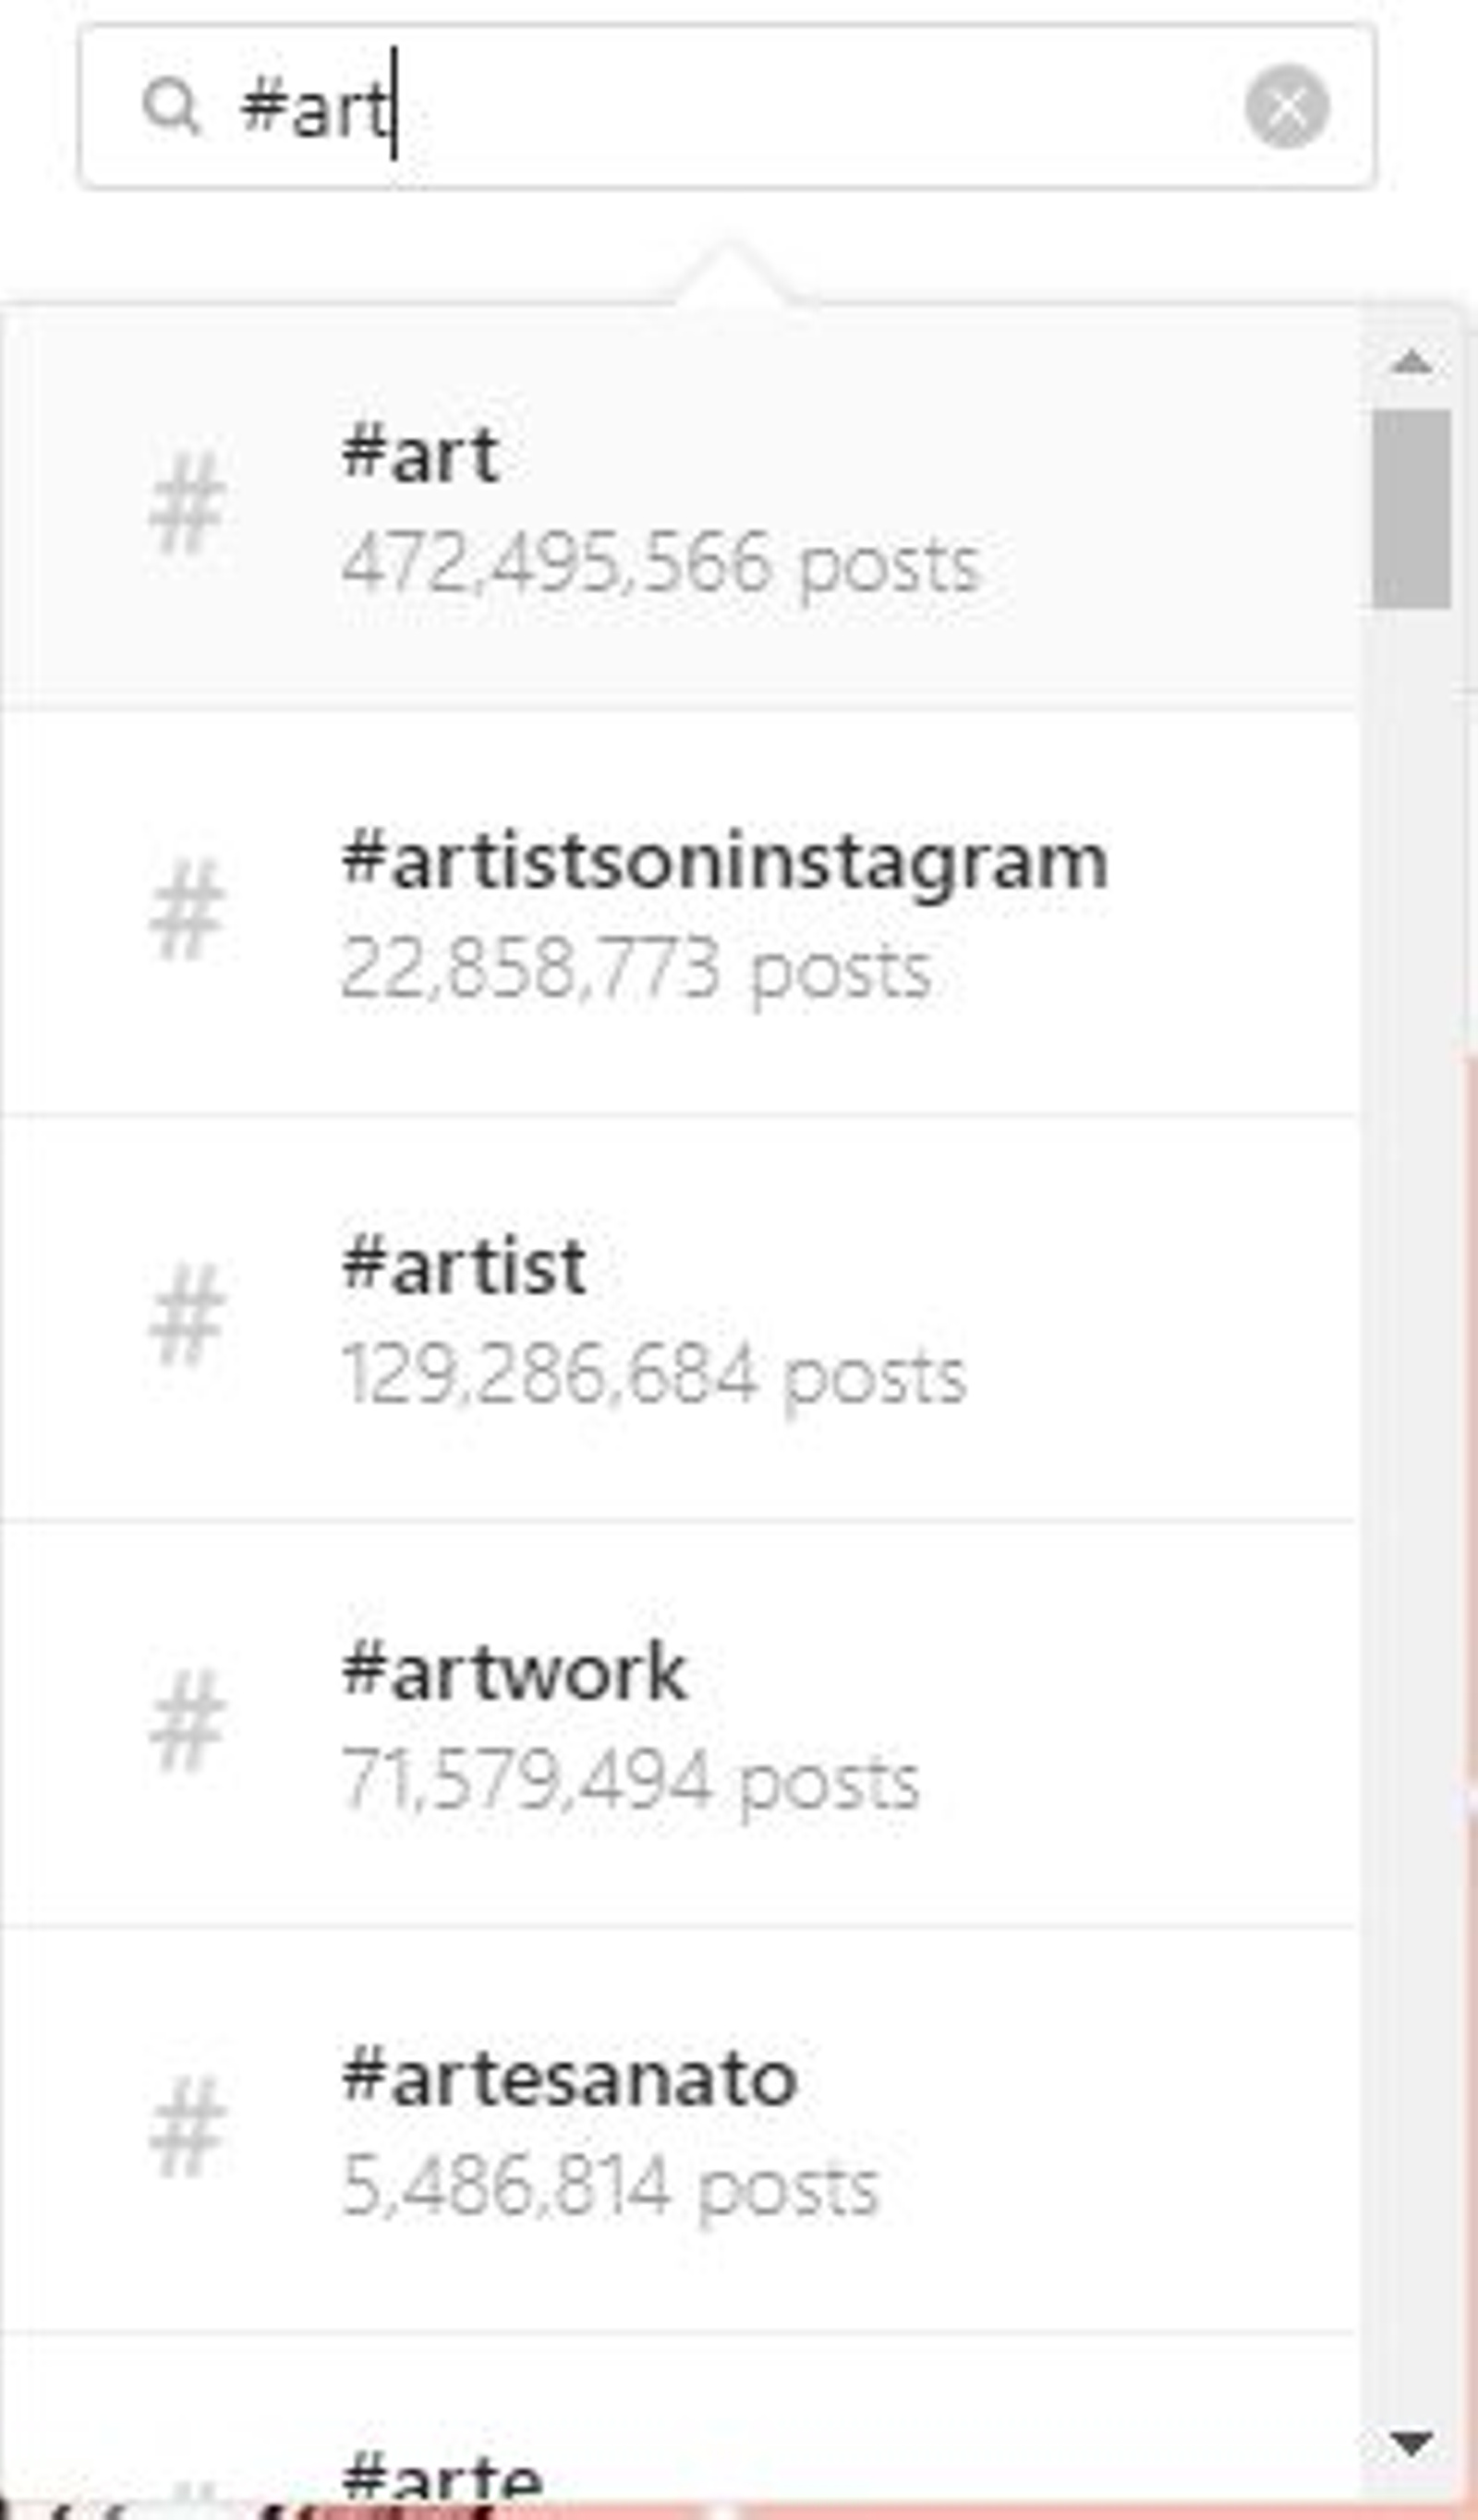 hashtag_research_art.jpg